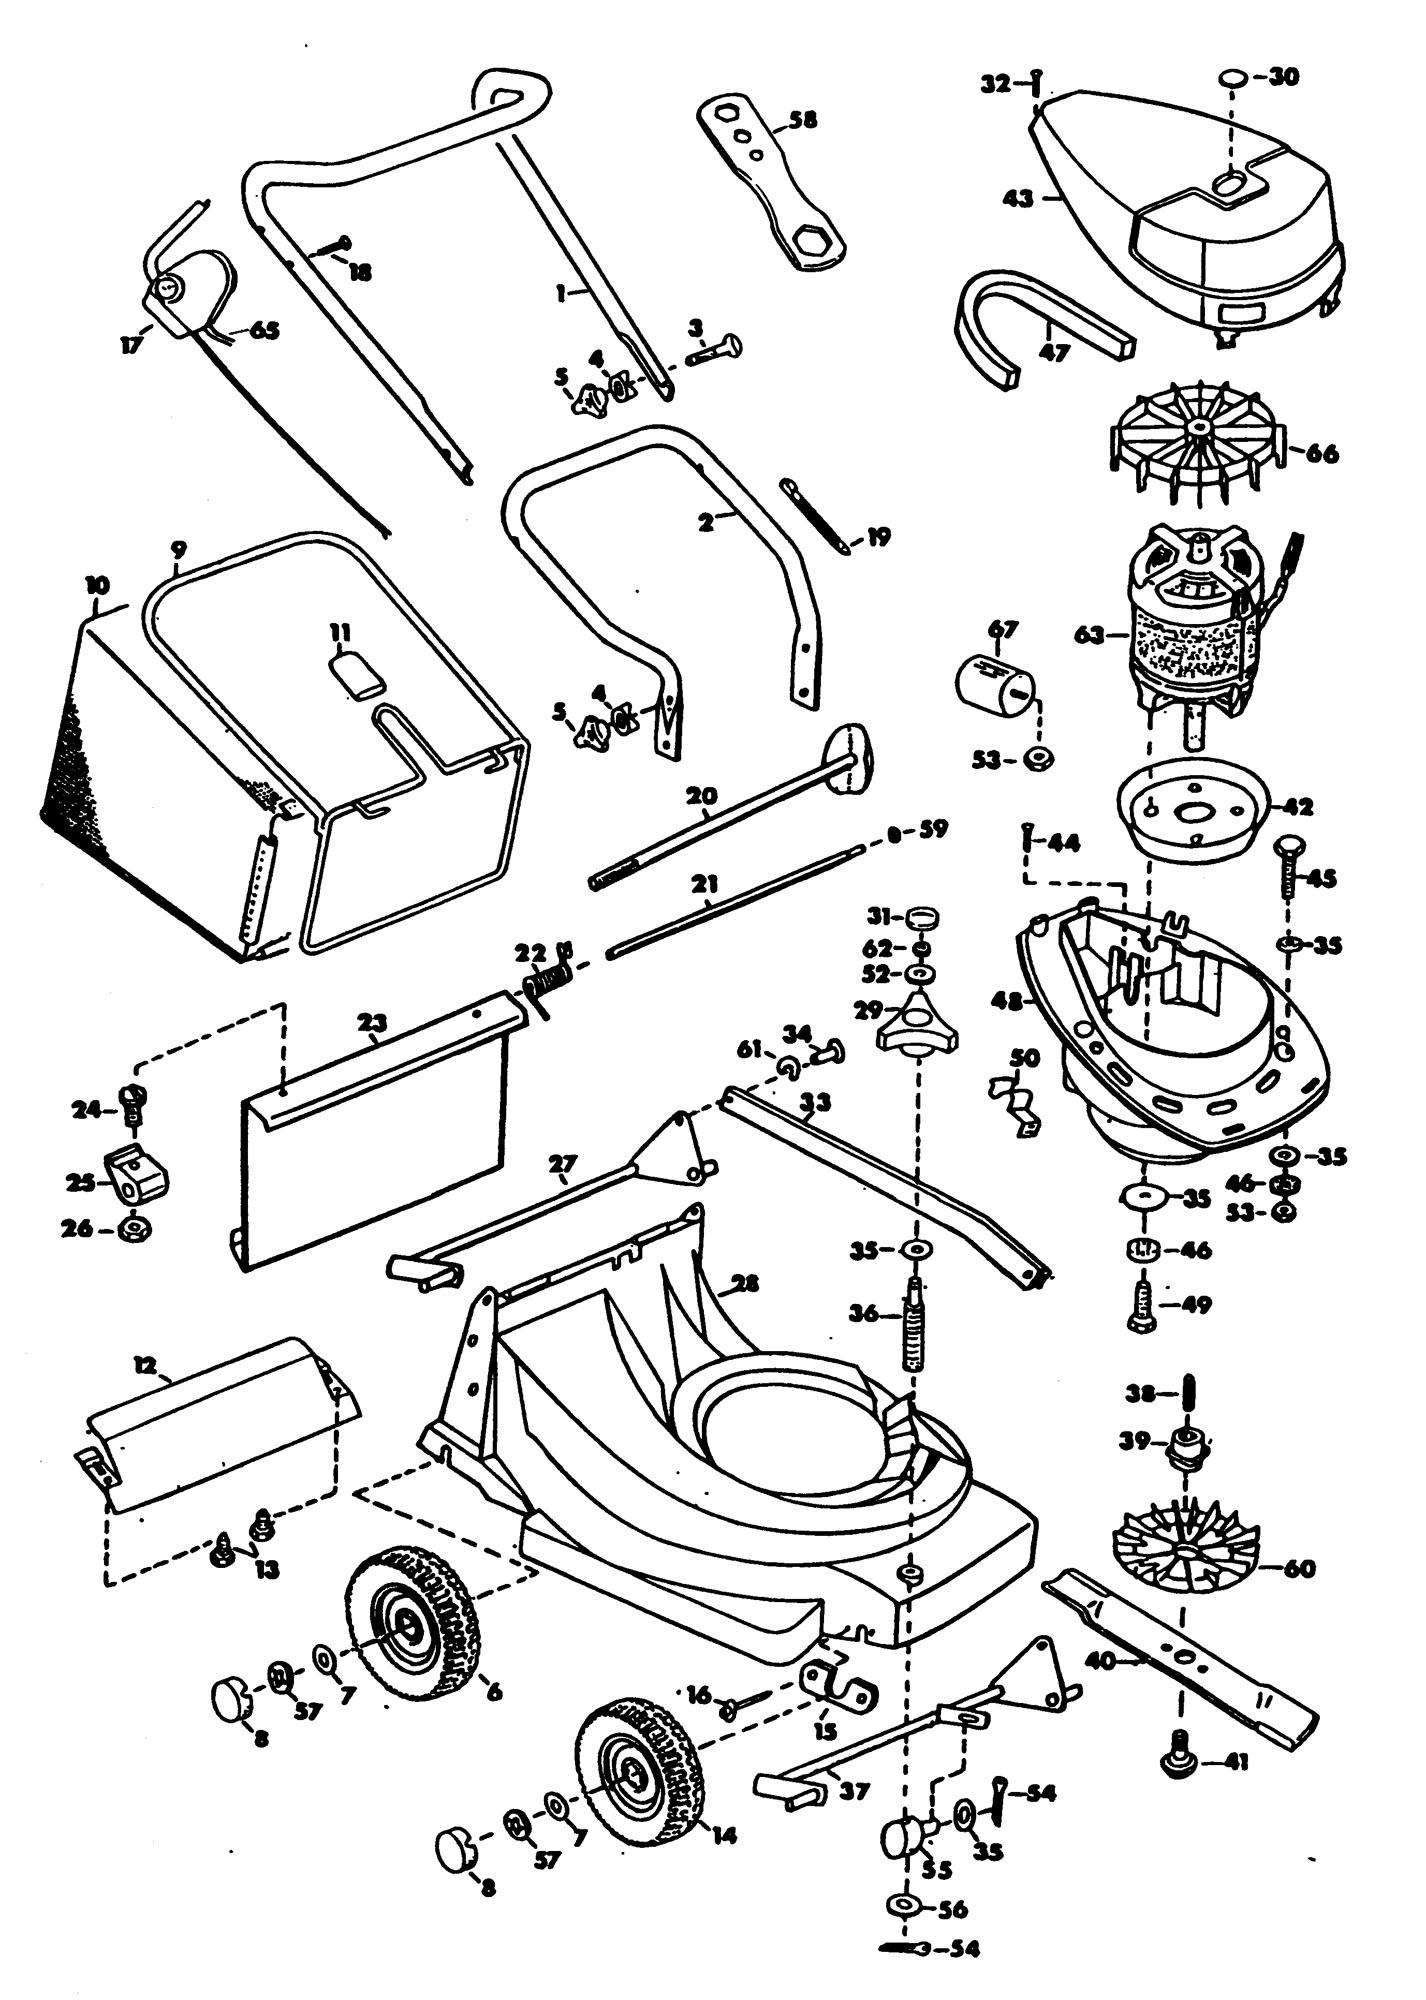 Spares for Black & Decker Gr520c Rotary Mower (type 1